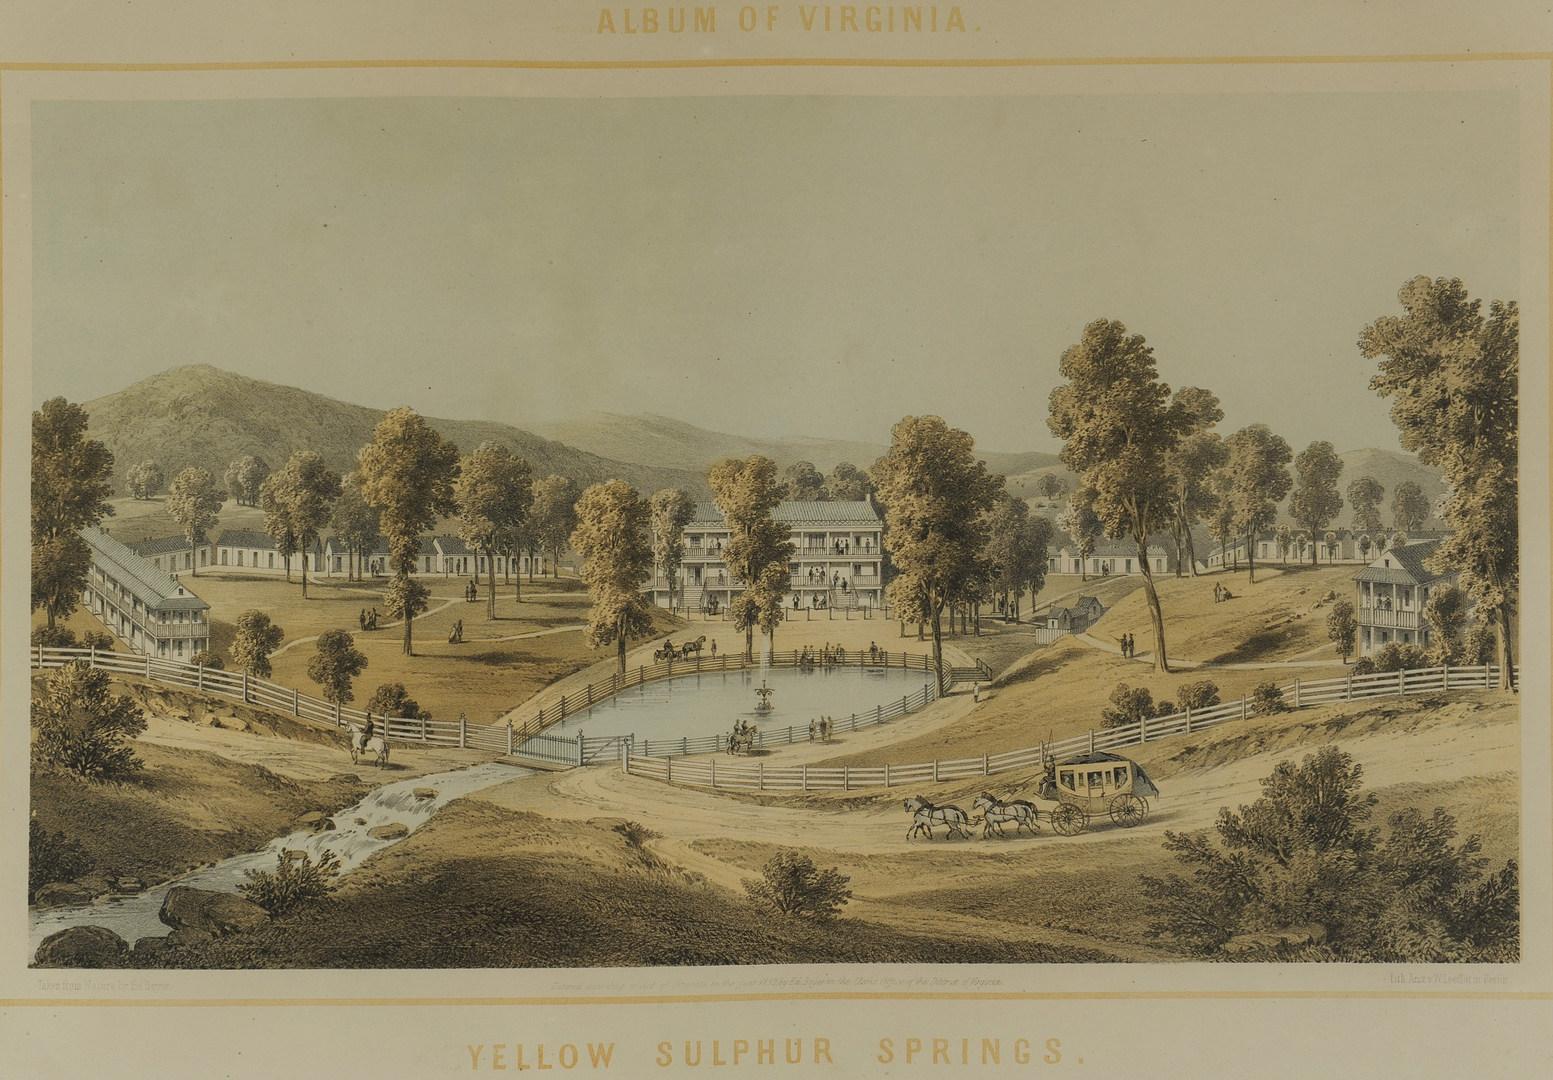 Lot 362: 2 Edward Beyer Album of Virginia Lithographs